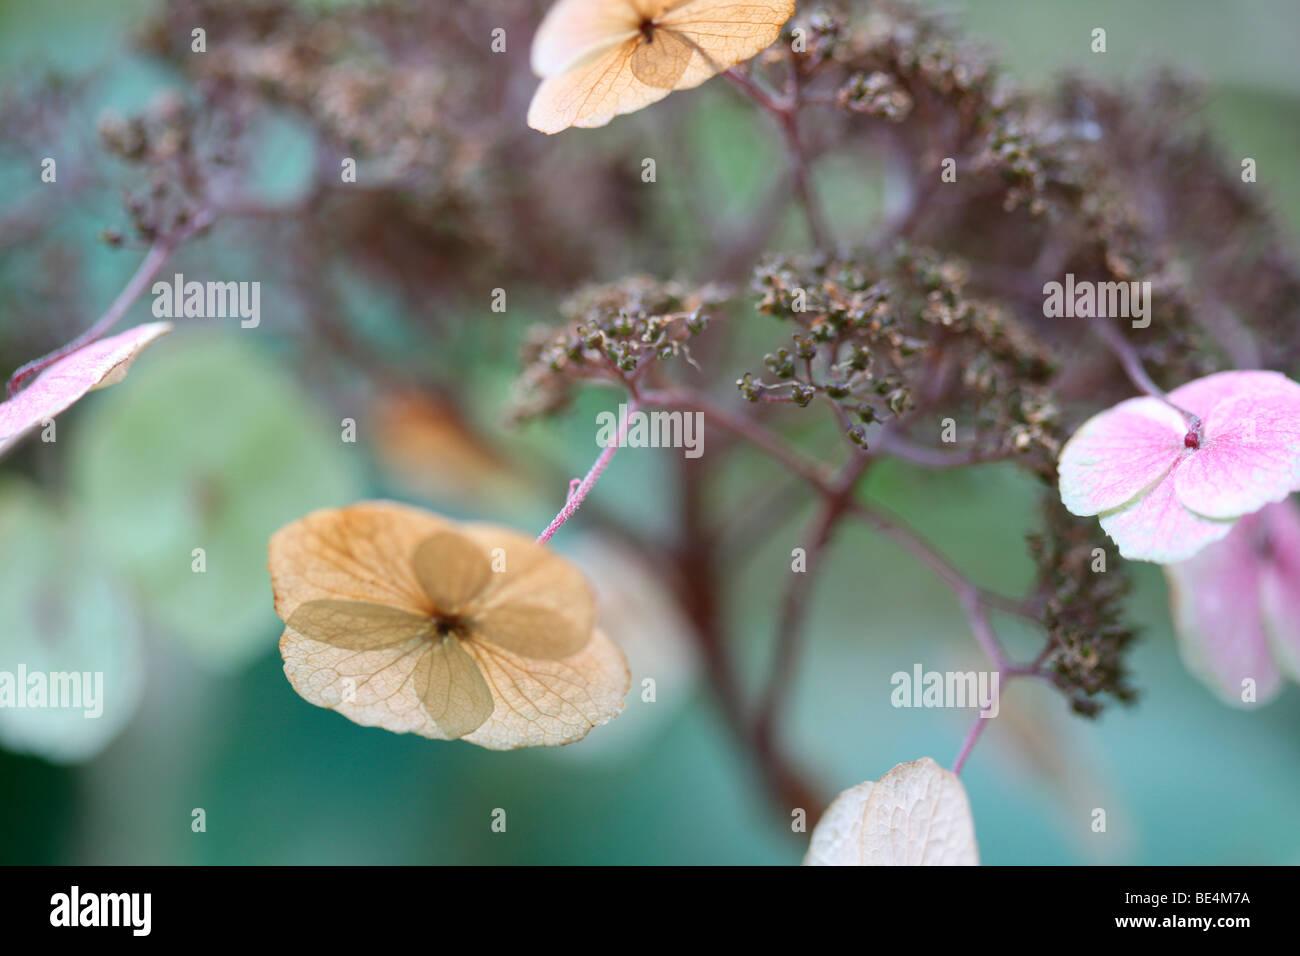 Delightful Flowering Wild Hydrangea Sargentiana Rustic Plant-fine art photography Jane-Ann Butler Photography JABP606 - Stock Image